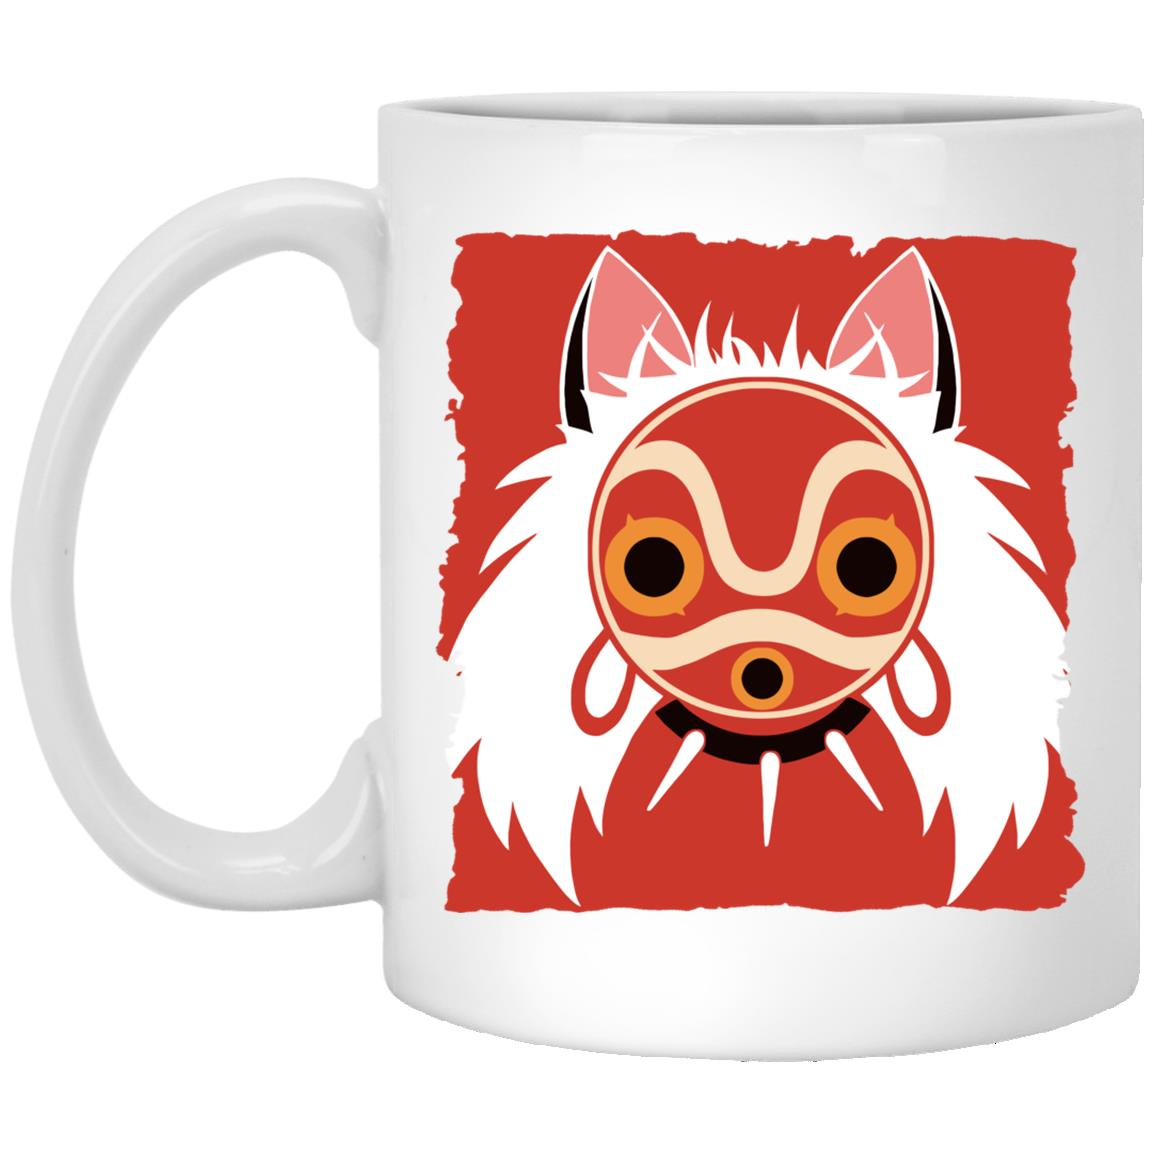 Princess Mononoke Mask Classic Mug